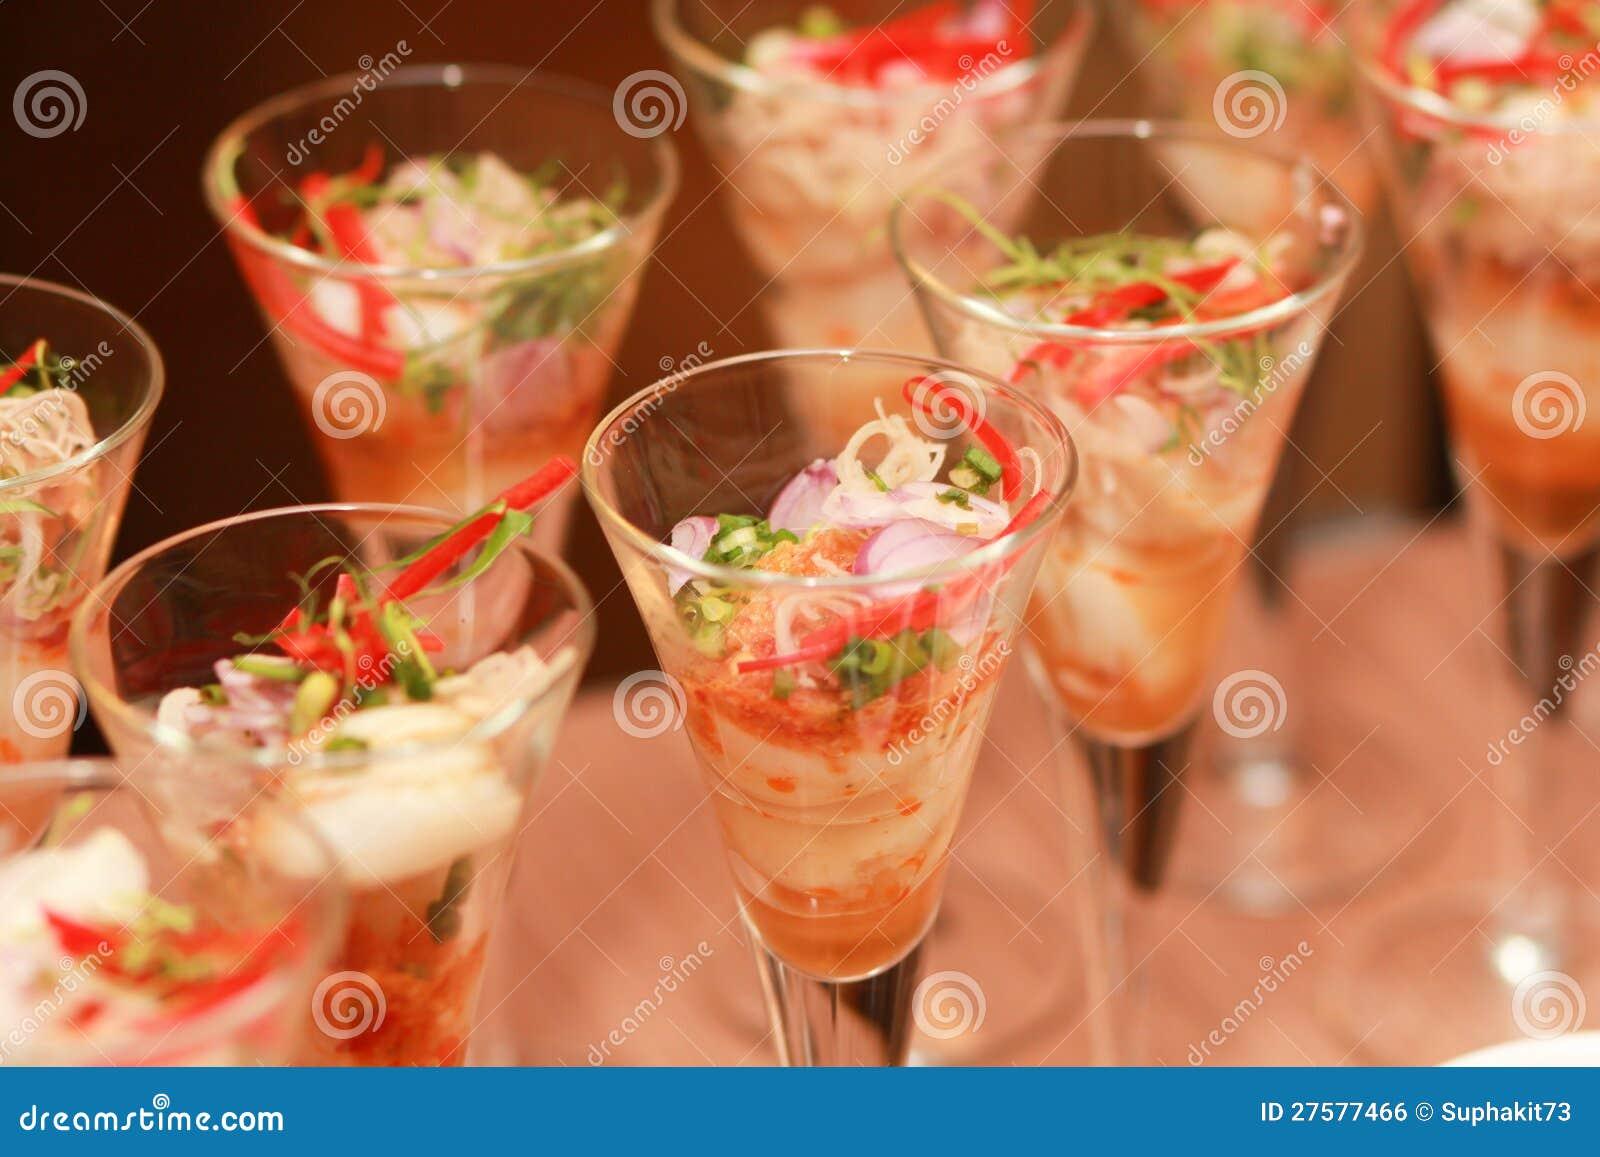 Decorations foods.